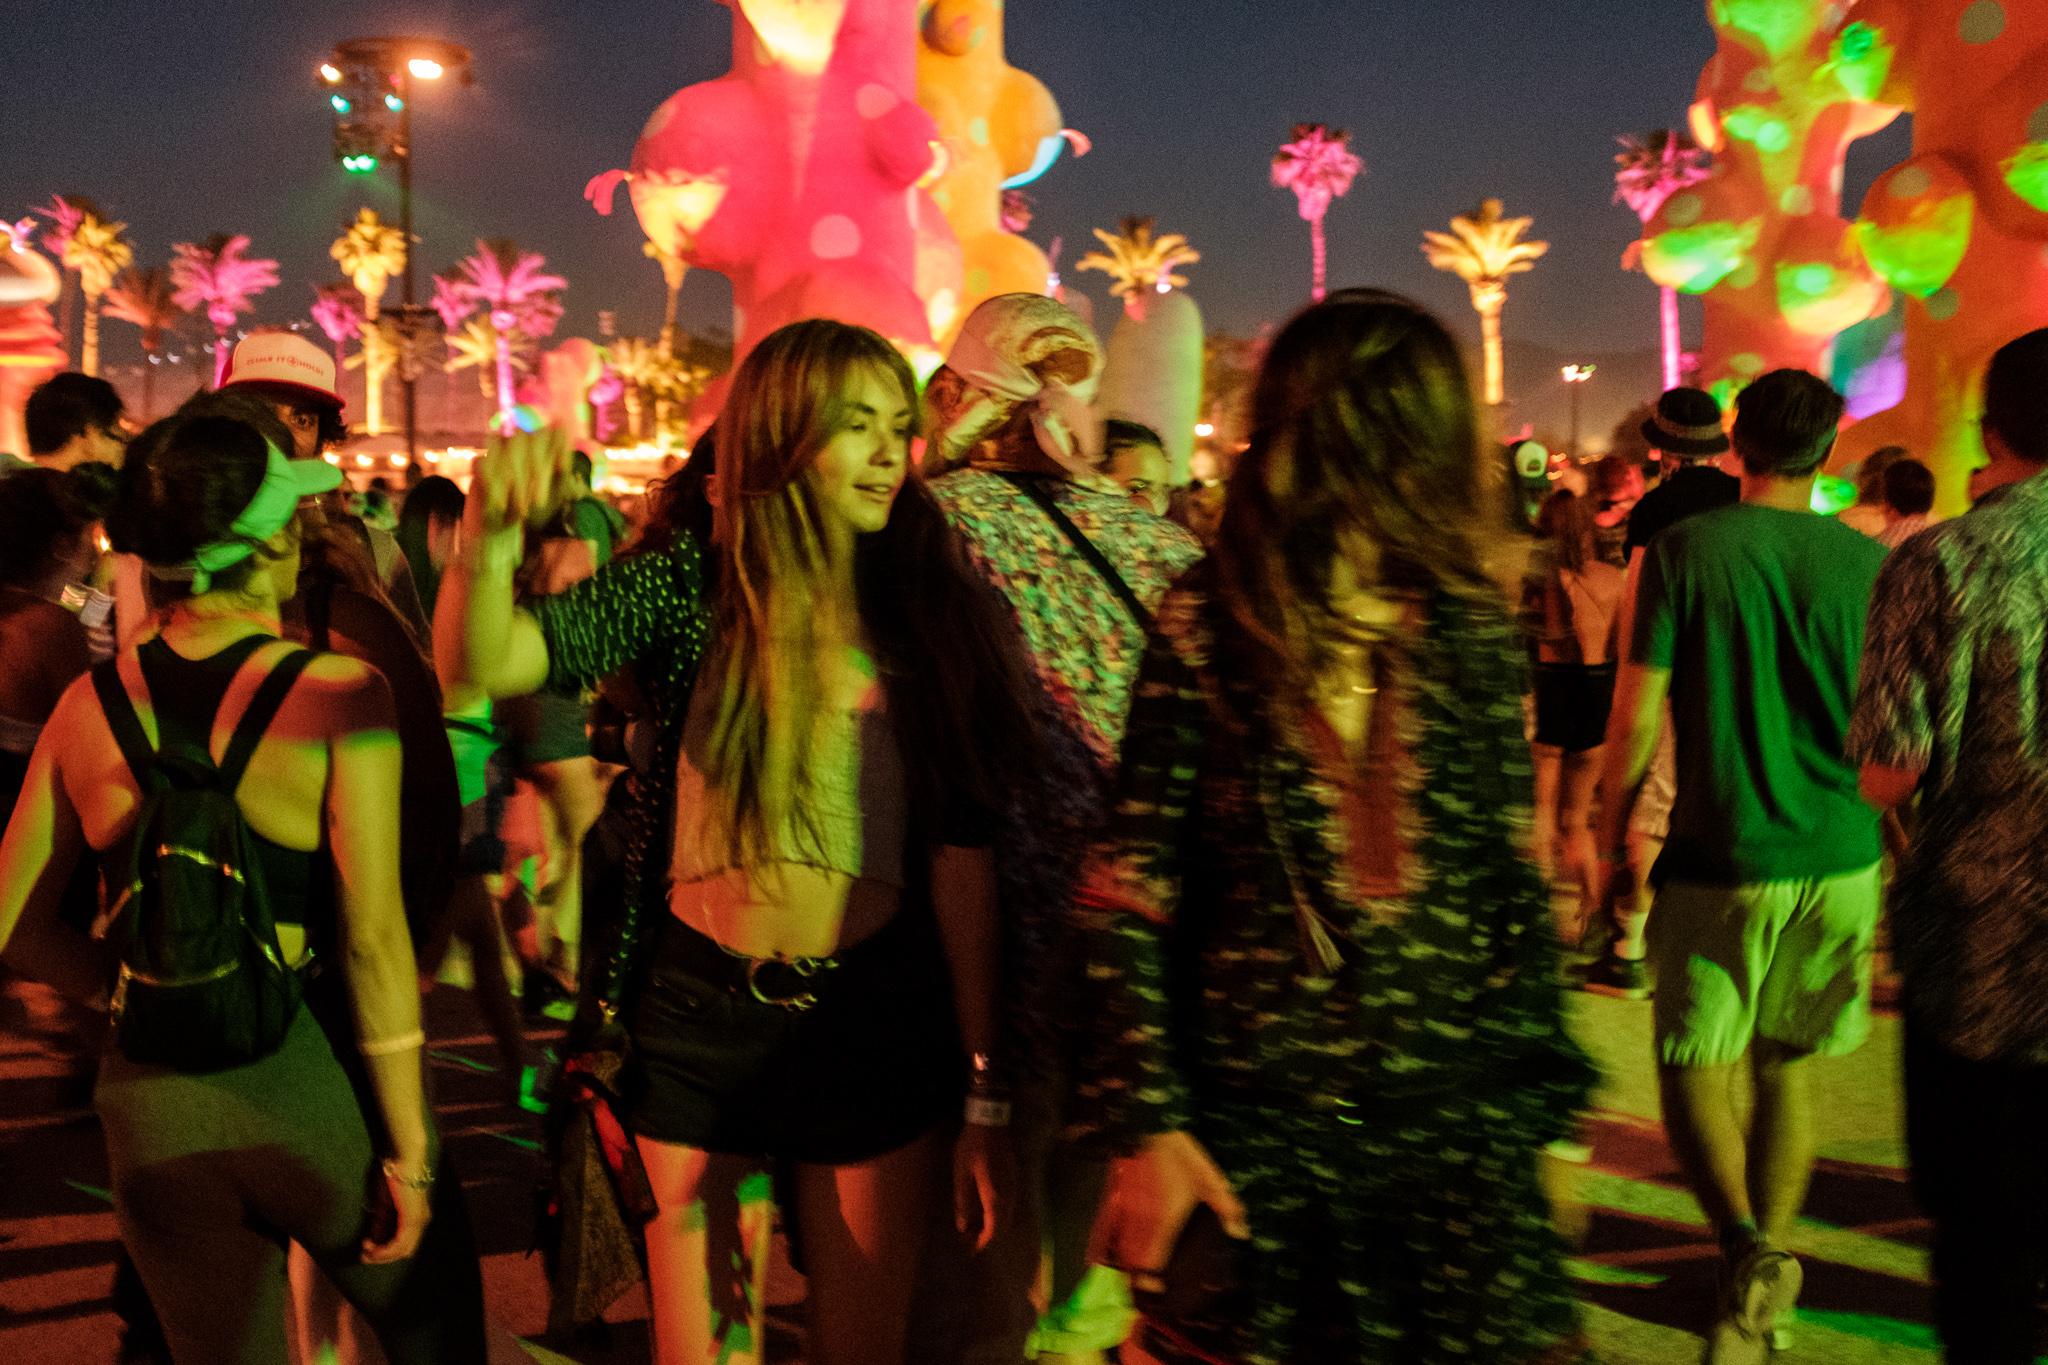 170423 Coachella 17 w2 2139.jpg